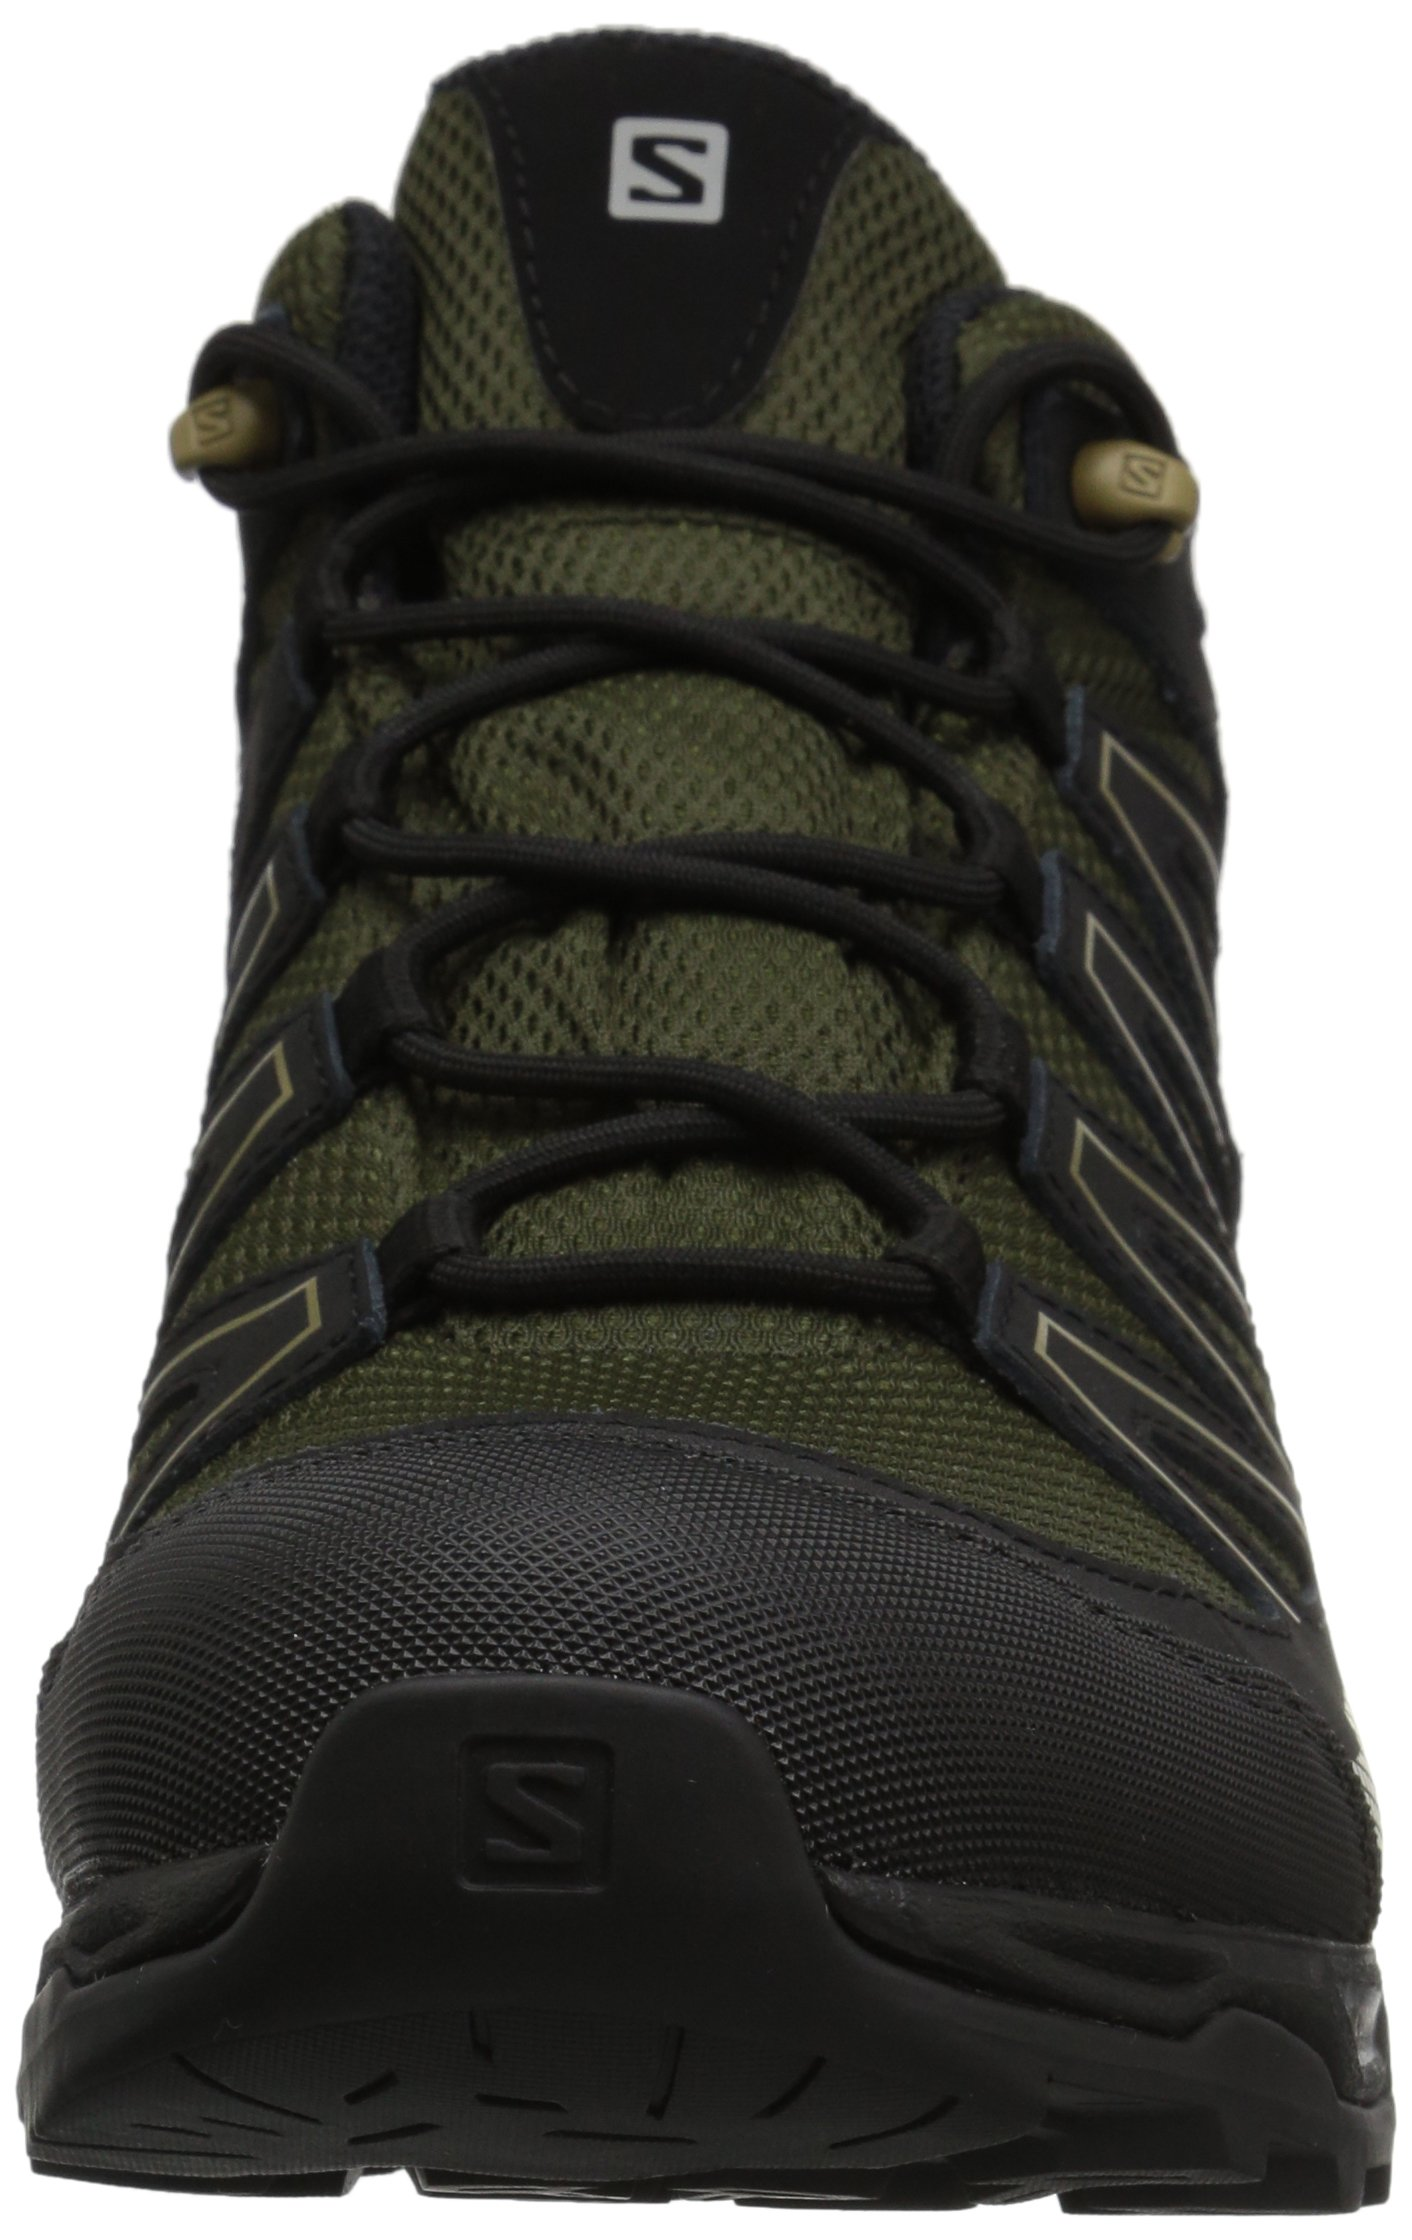 56a8c93b1a5 Salomon Men's Pathfinder MID CSWP M Walking Shoe